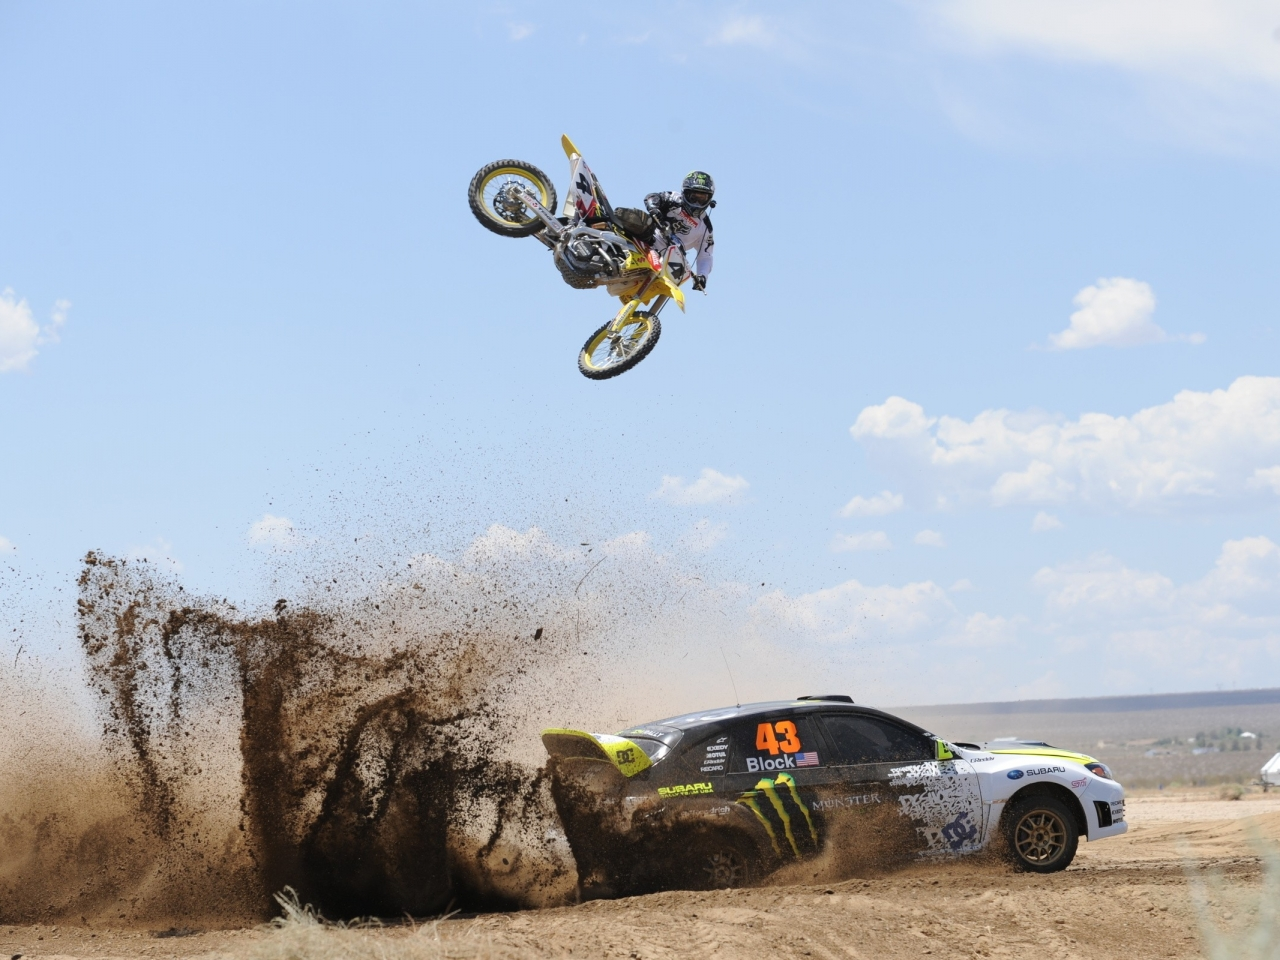 Salto de moto sobre auto - 1280x960